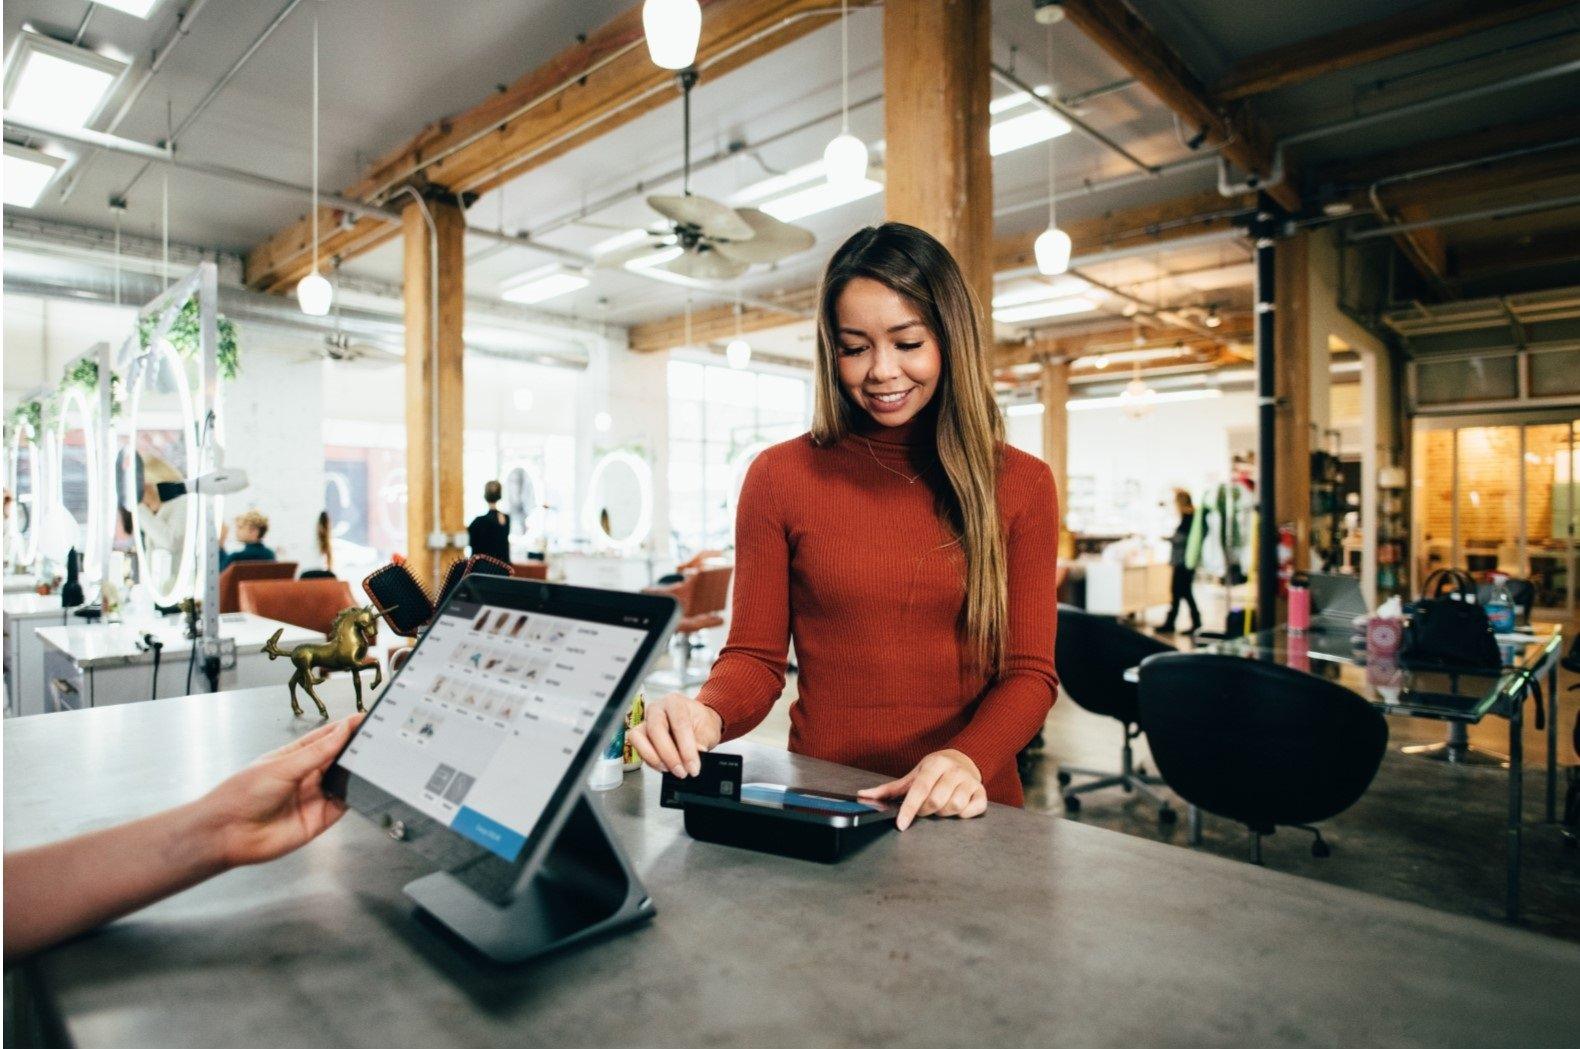 Tendência de mercado, cashback movimenta varejo online